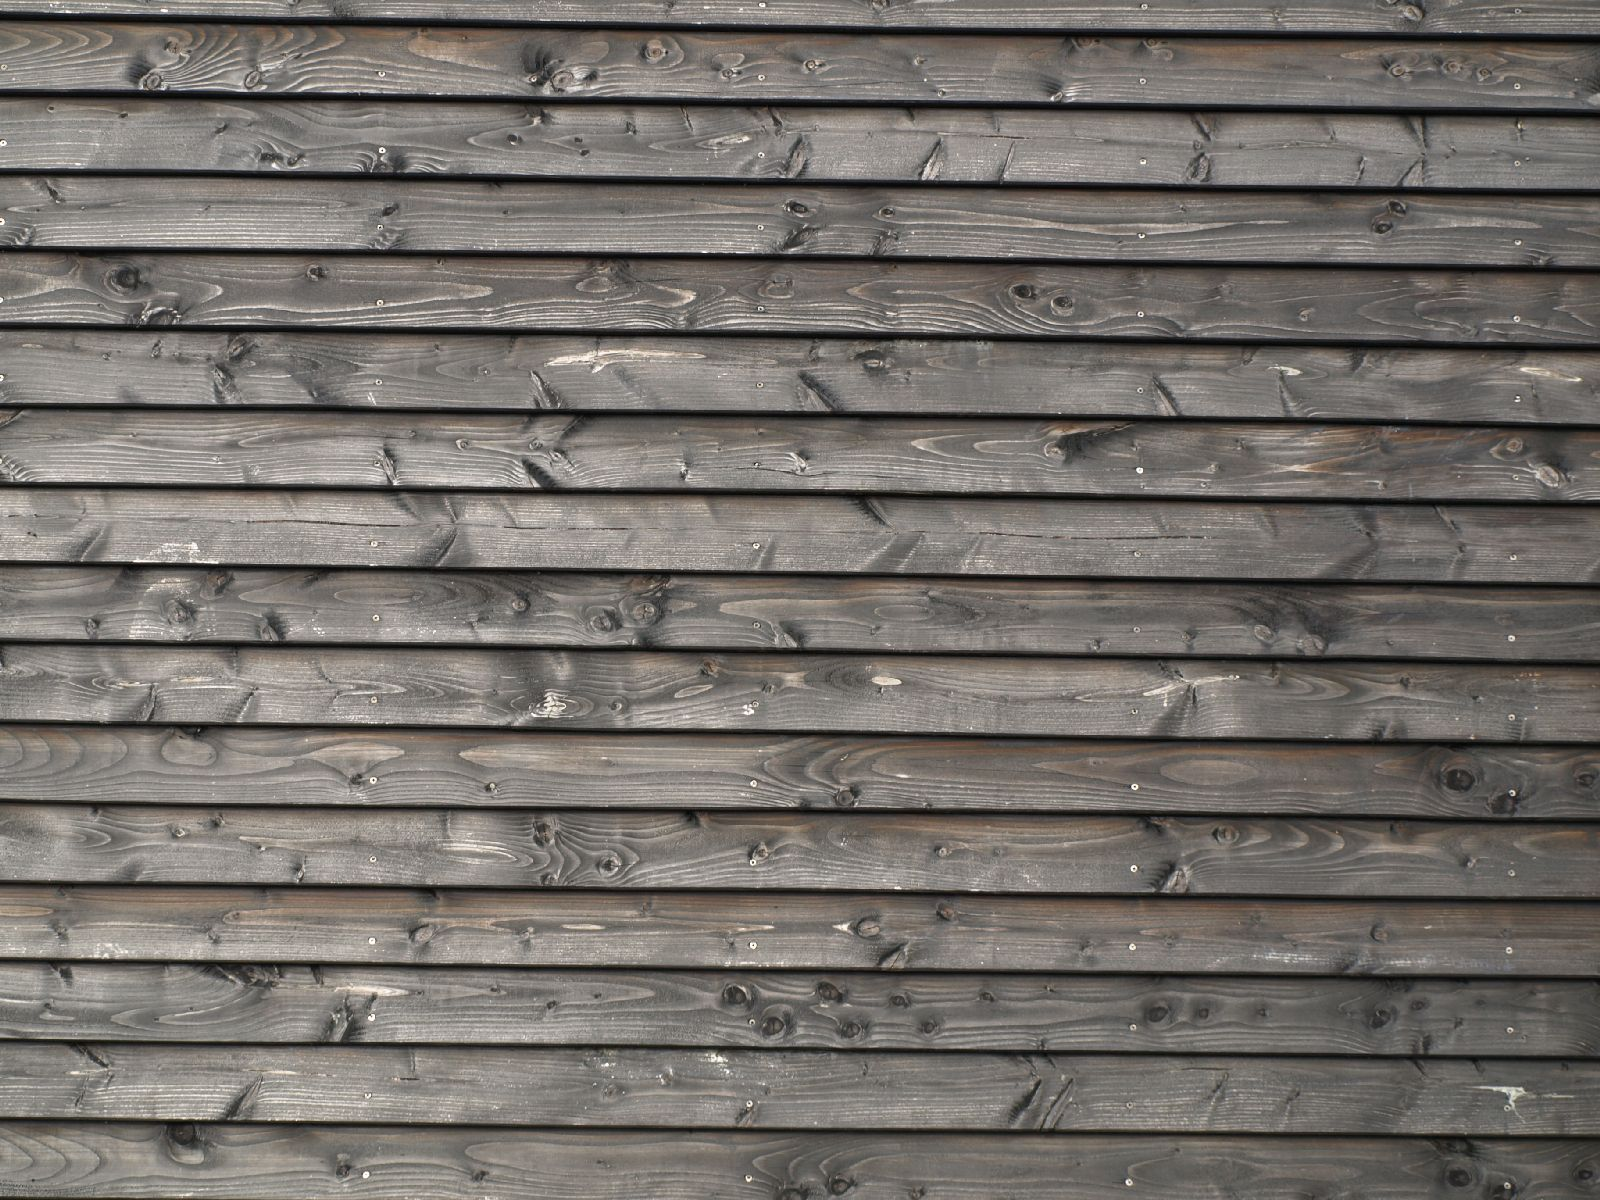 Wood_Texture_A_P4201505